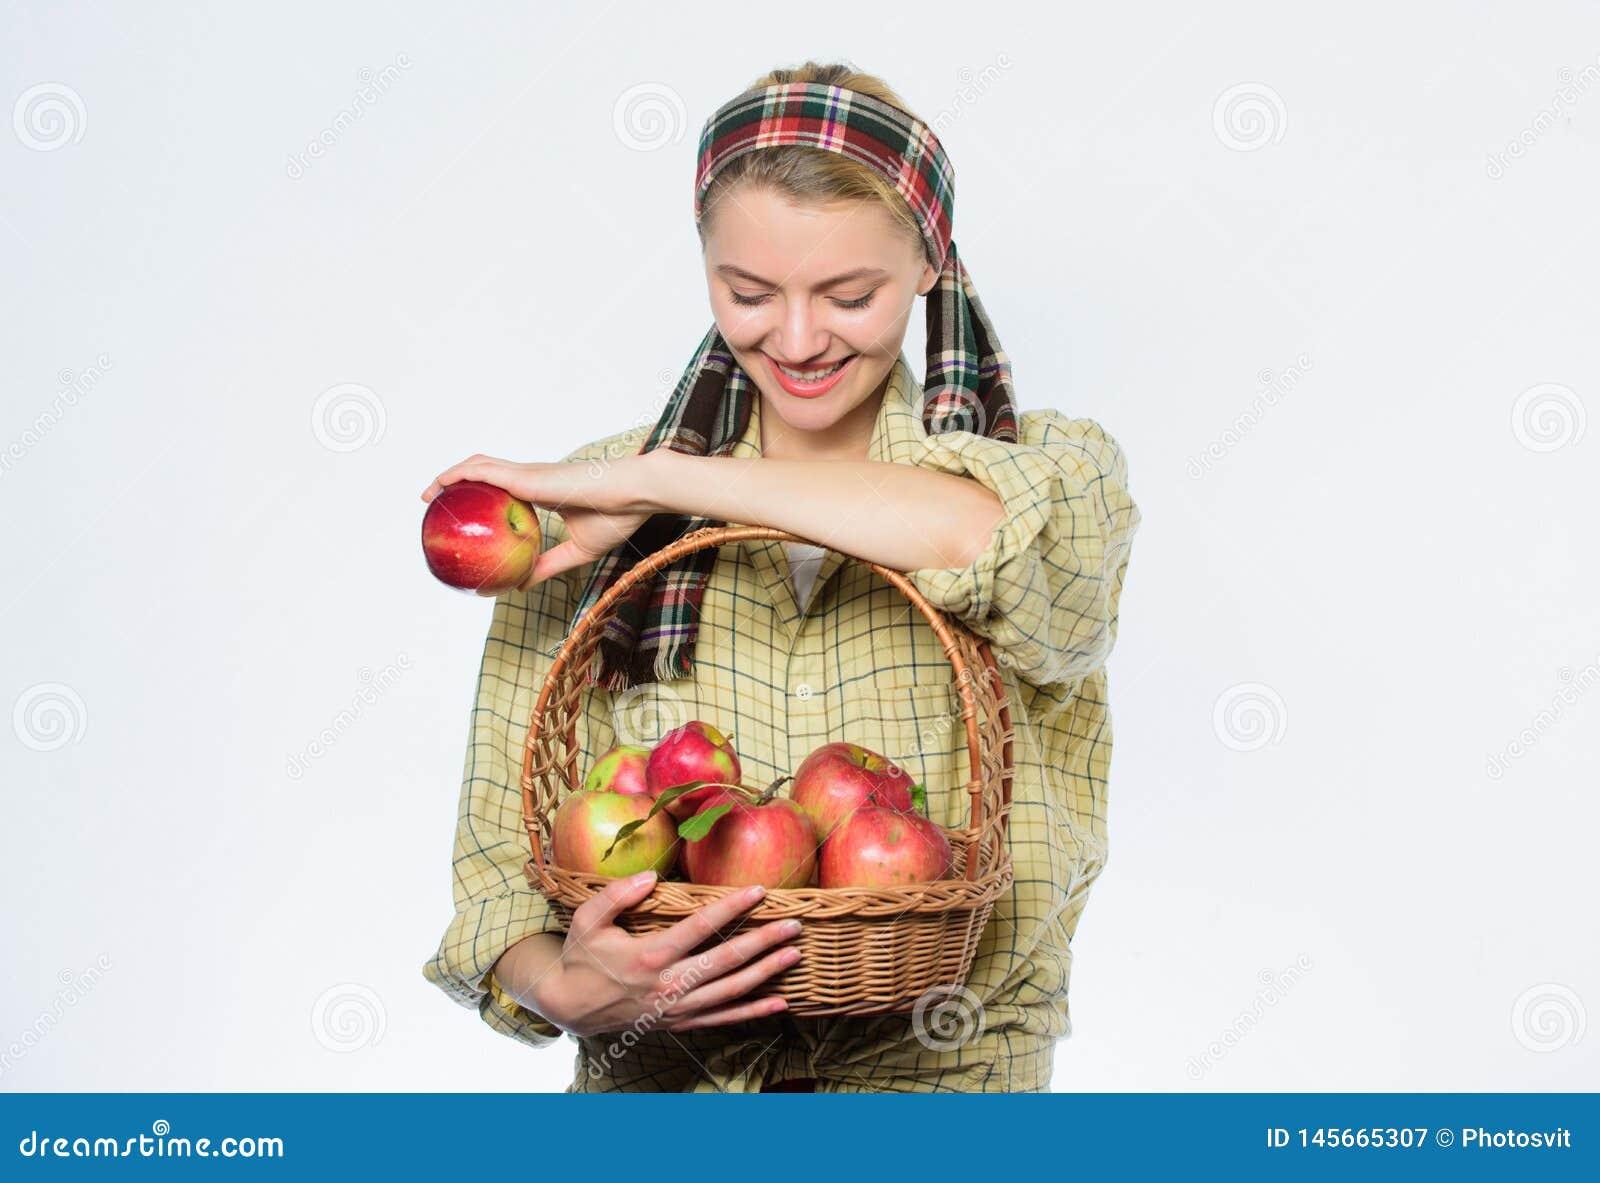 Picking best one. organic vegetarian. healthy teeth. Happy woman eating apple. orchard, gardener girl with apple basket